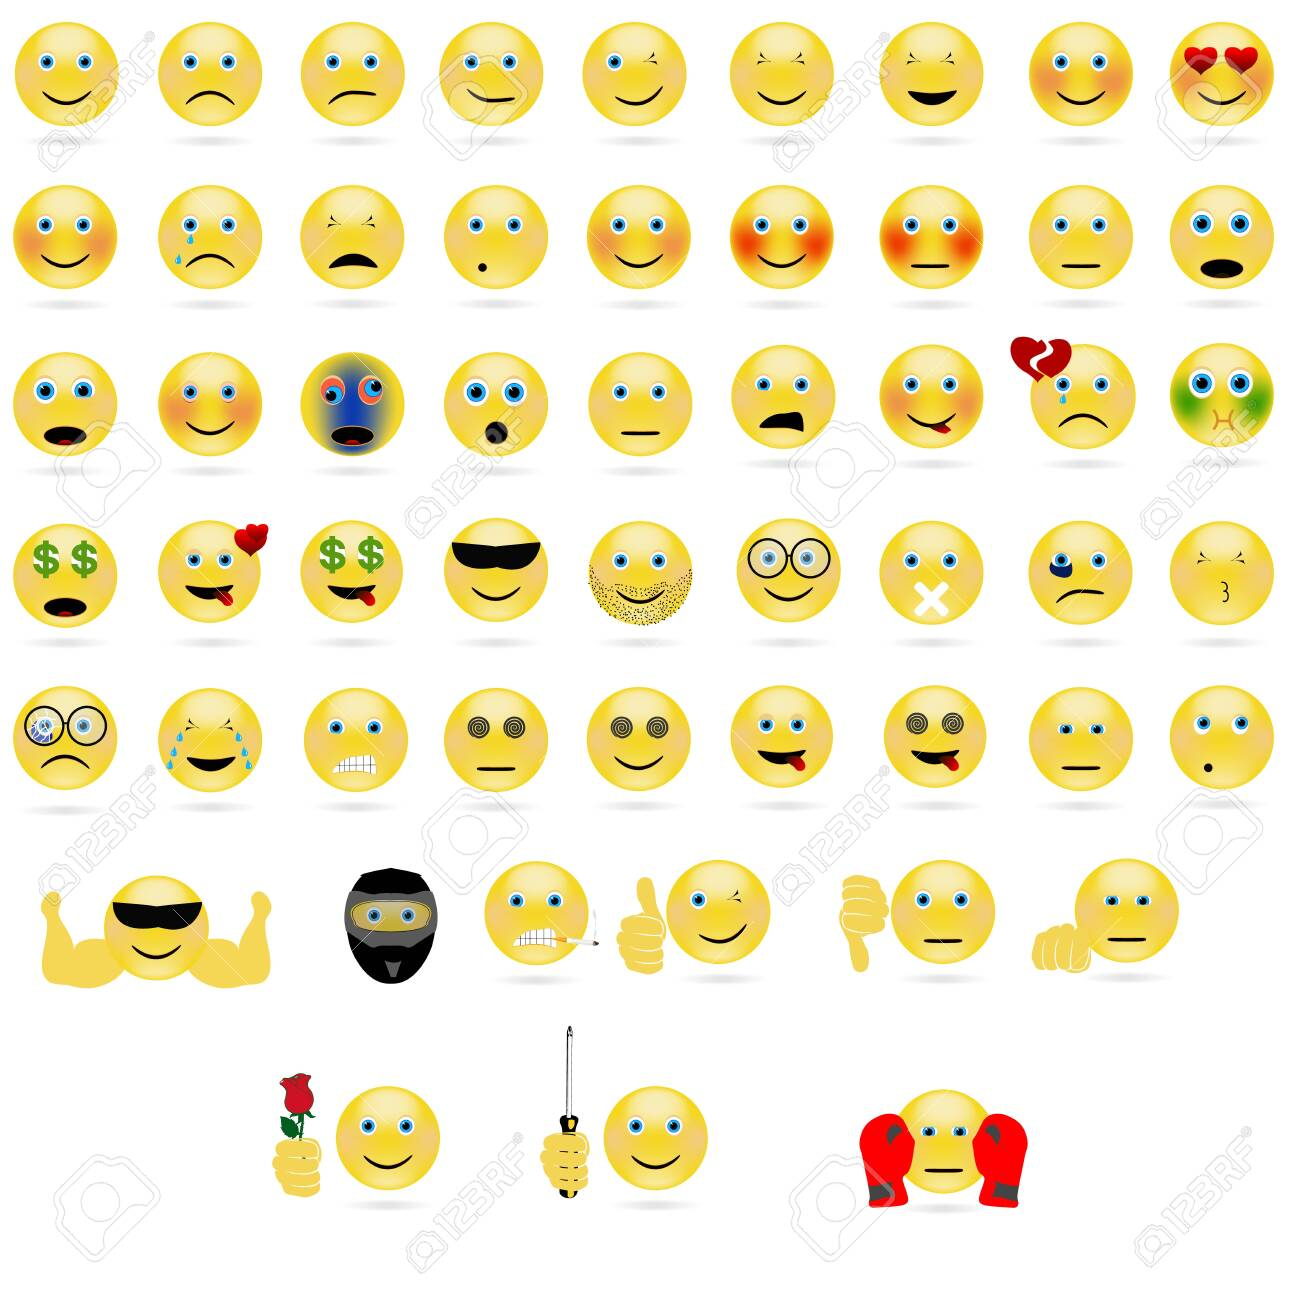 emotional face icons - 149902565